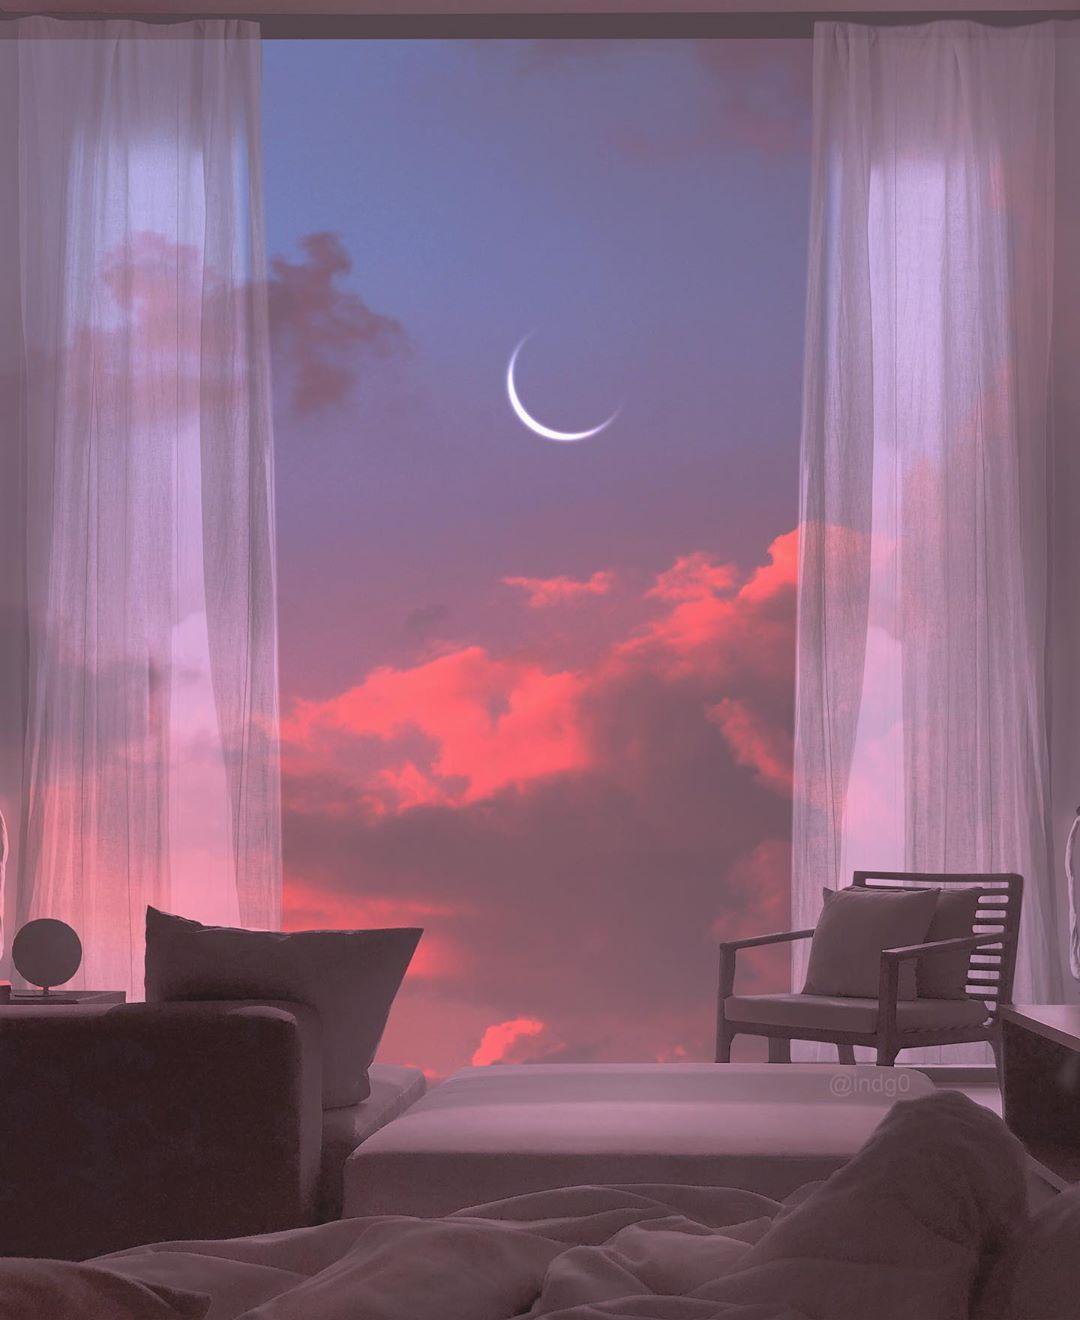 "I N D I G O on Instagram: ""�billie marten/peach • • • • • • #indg0 #art #night #photography #picture #drawing #digitalart #design #colors #music #interiordesign #moon…"""